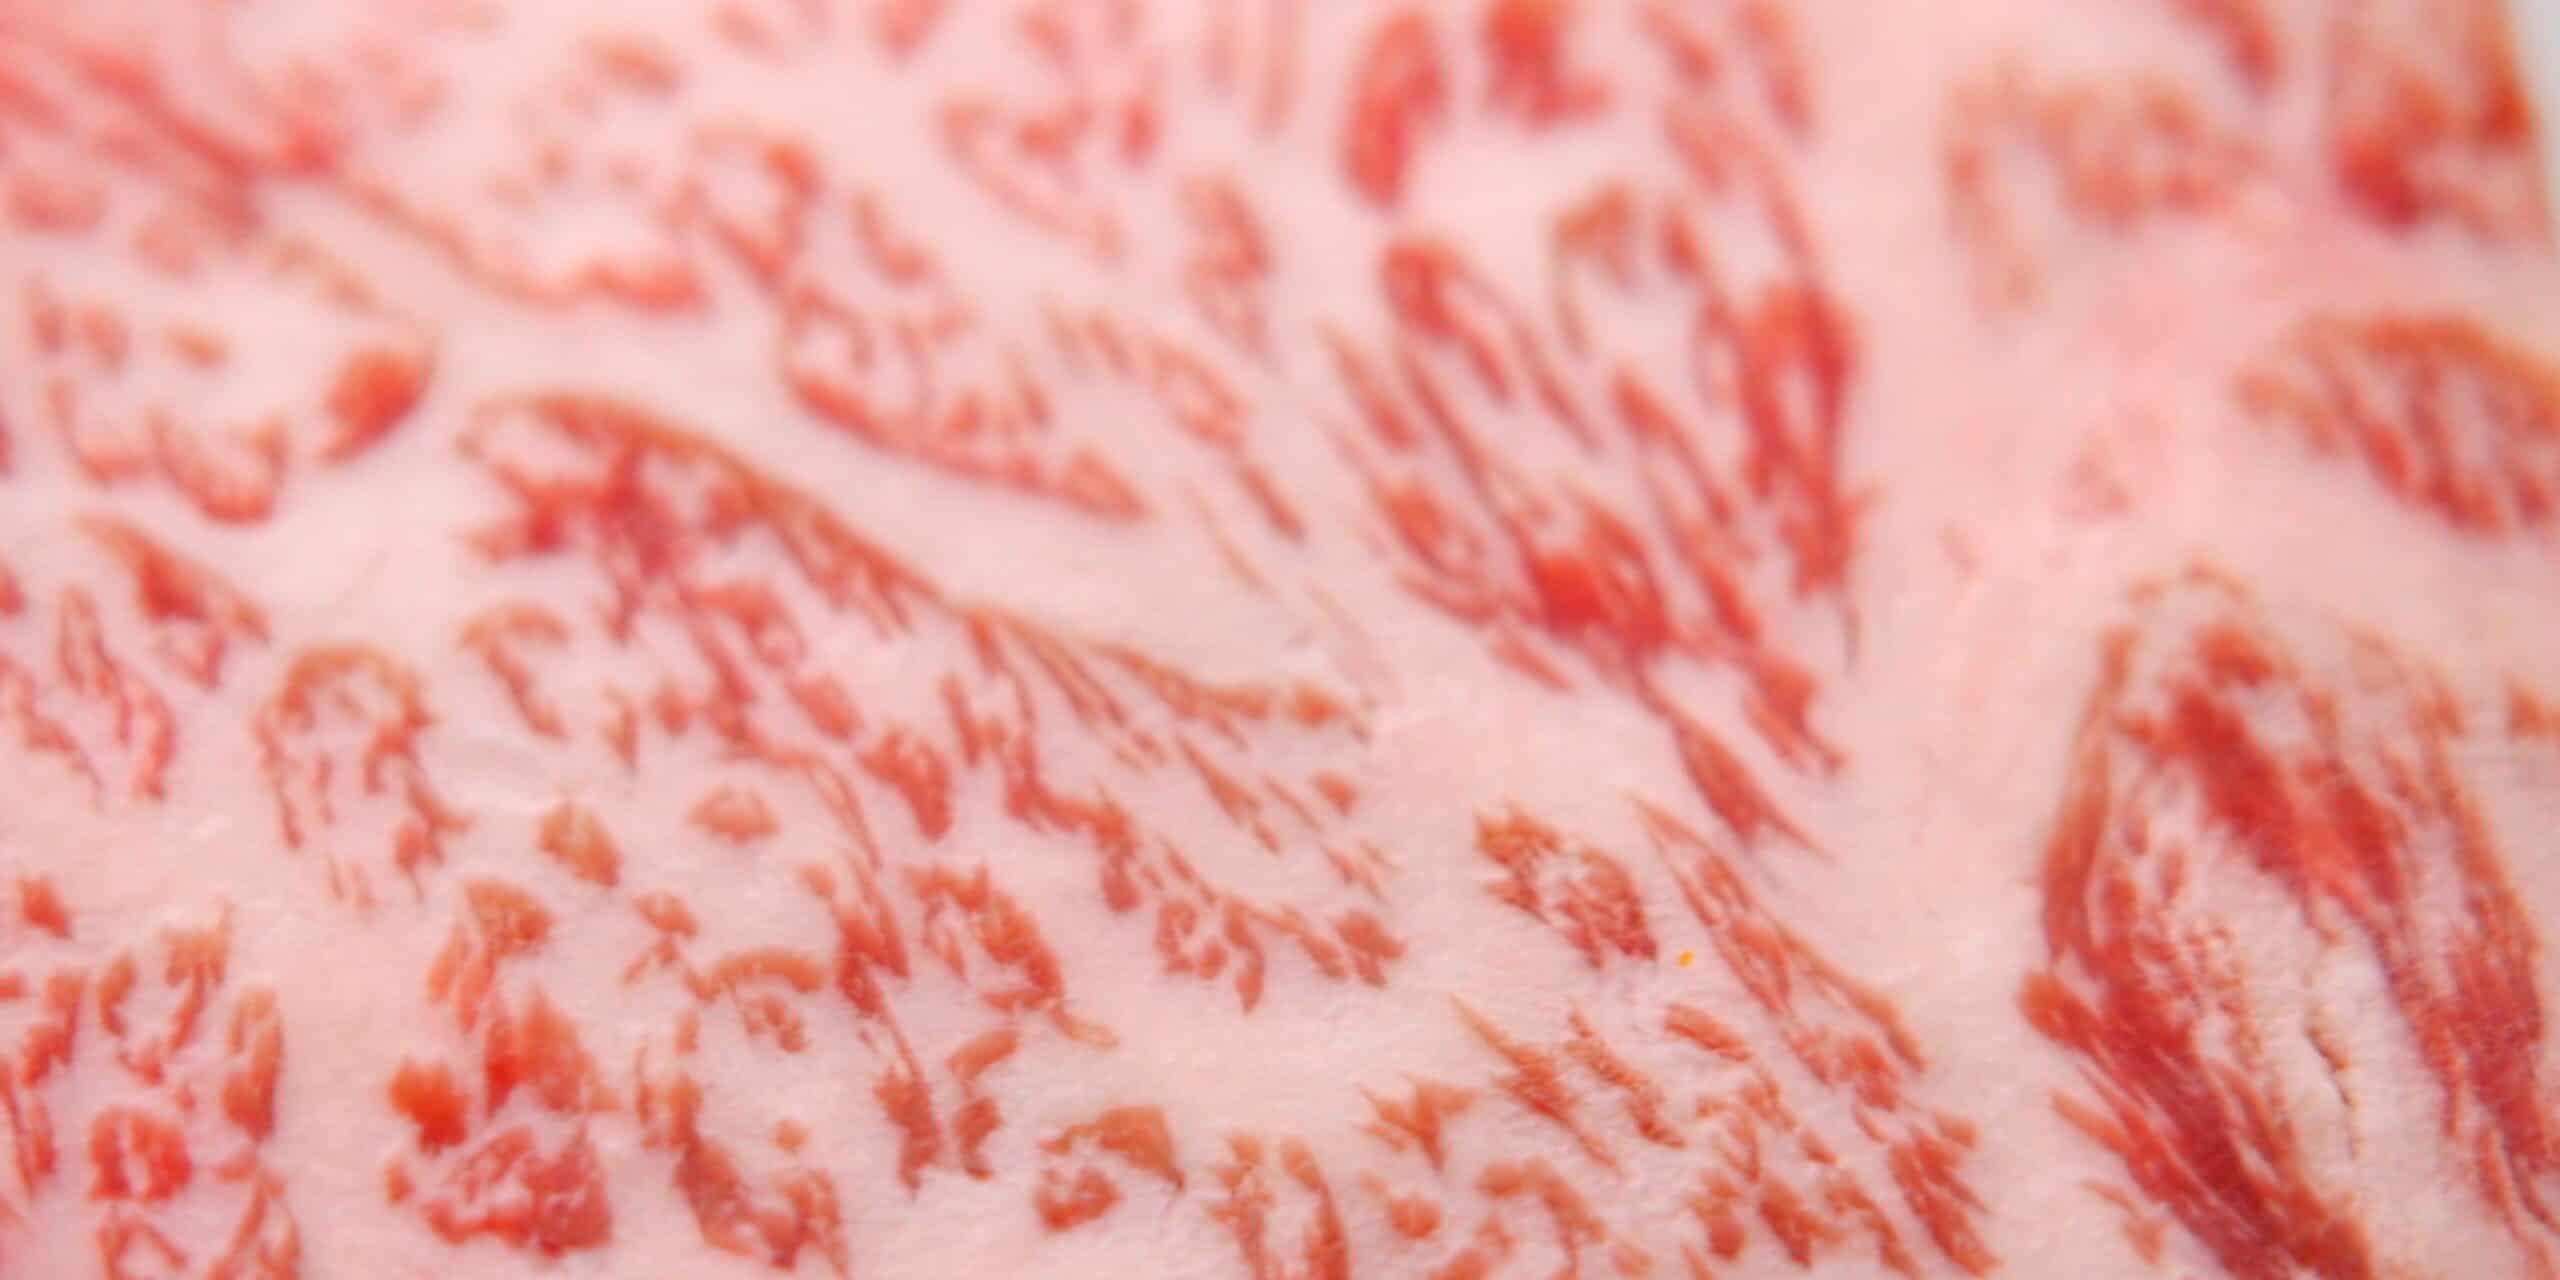 Closeup of marbling of A5 Grade Wagyu Sirloin.